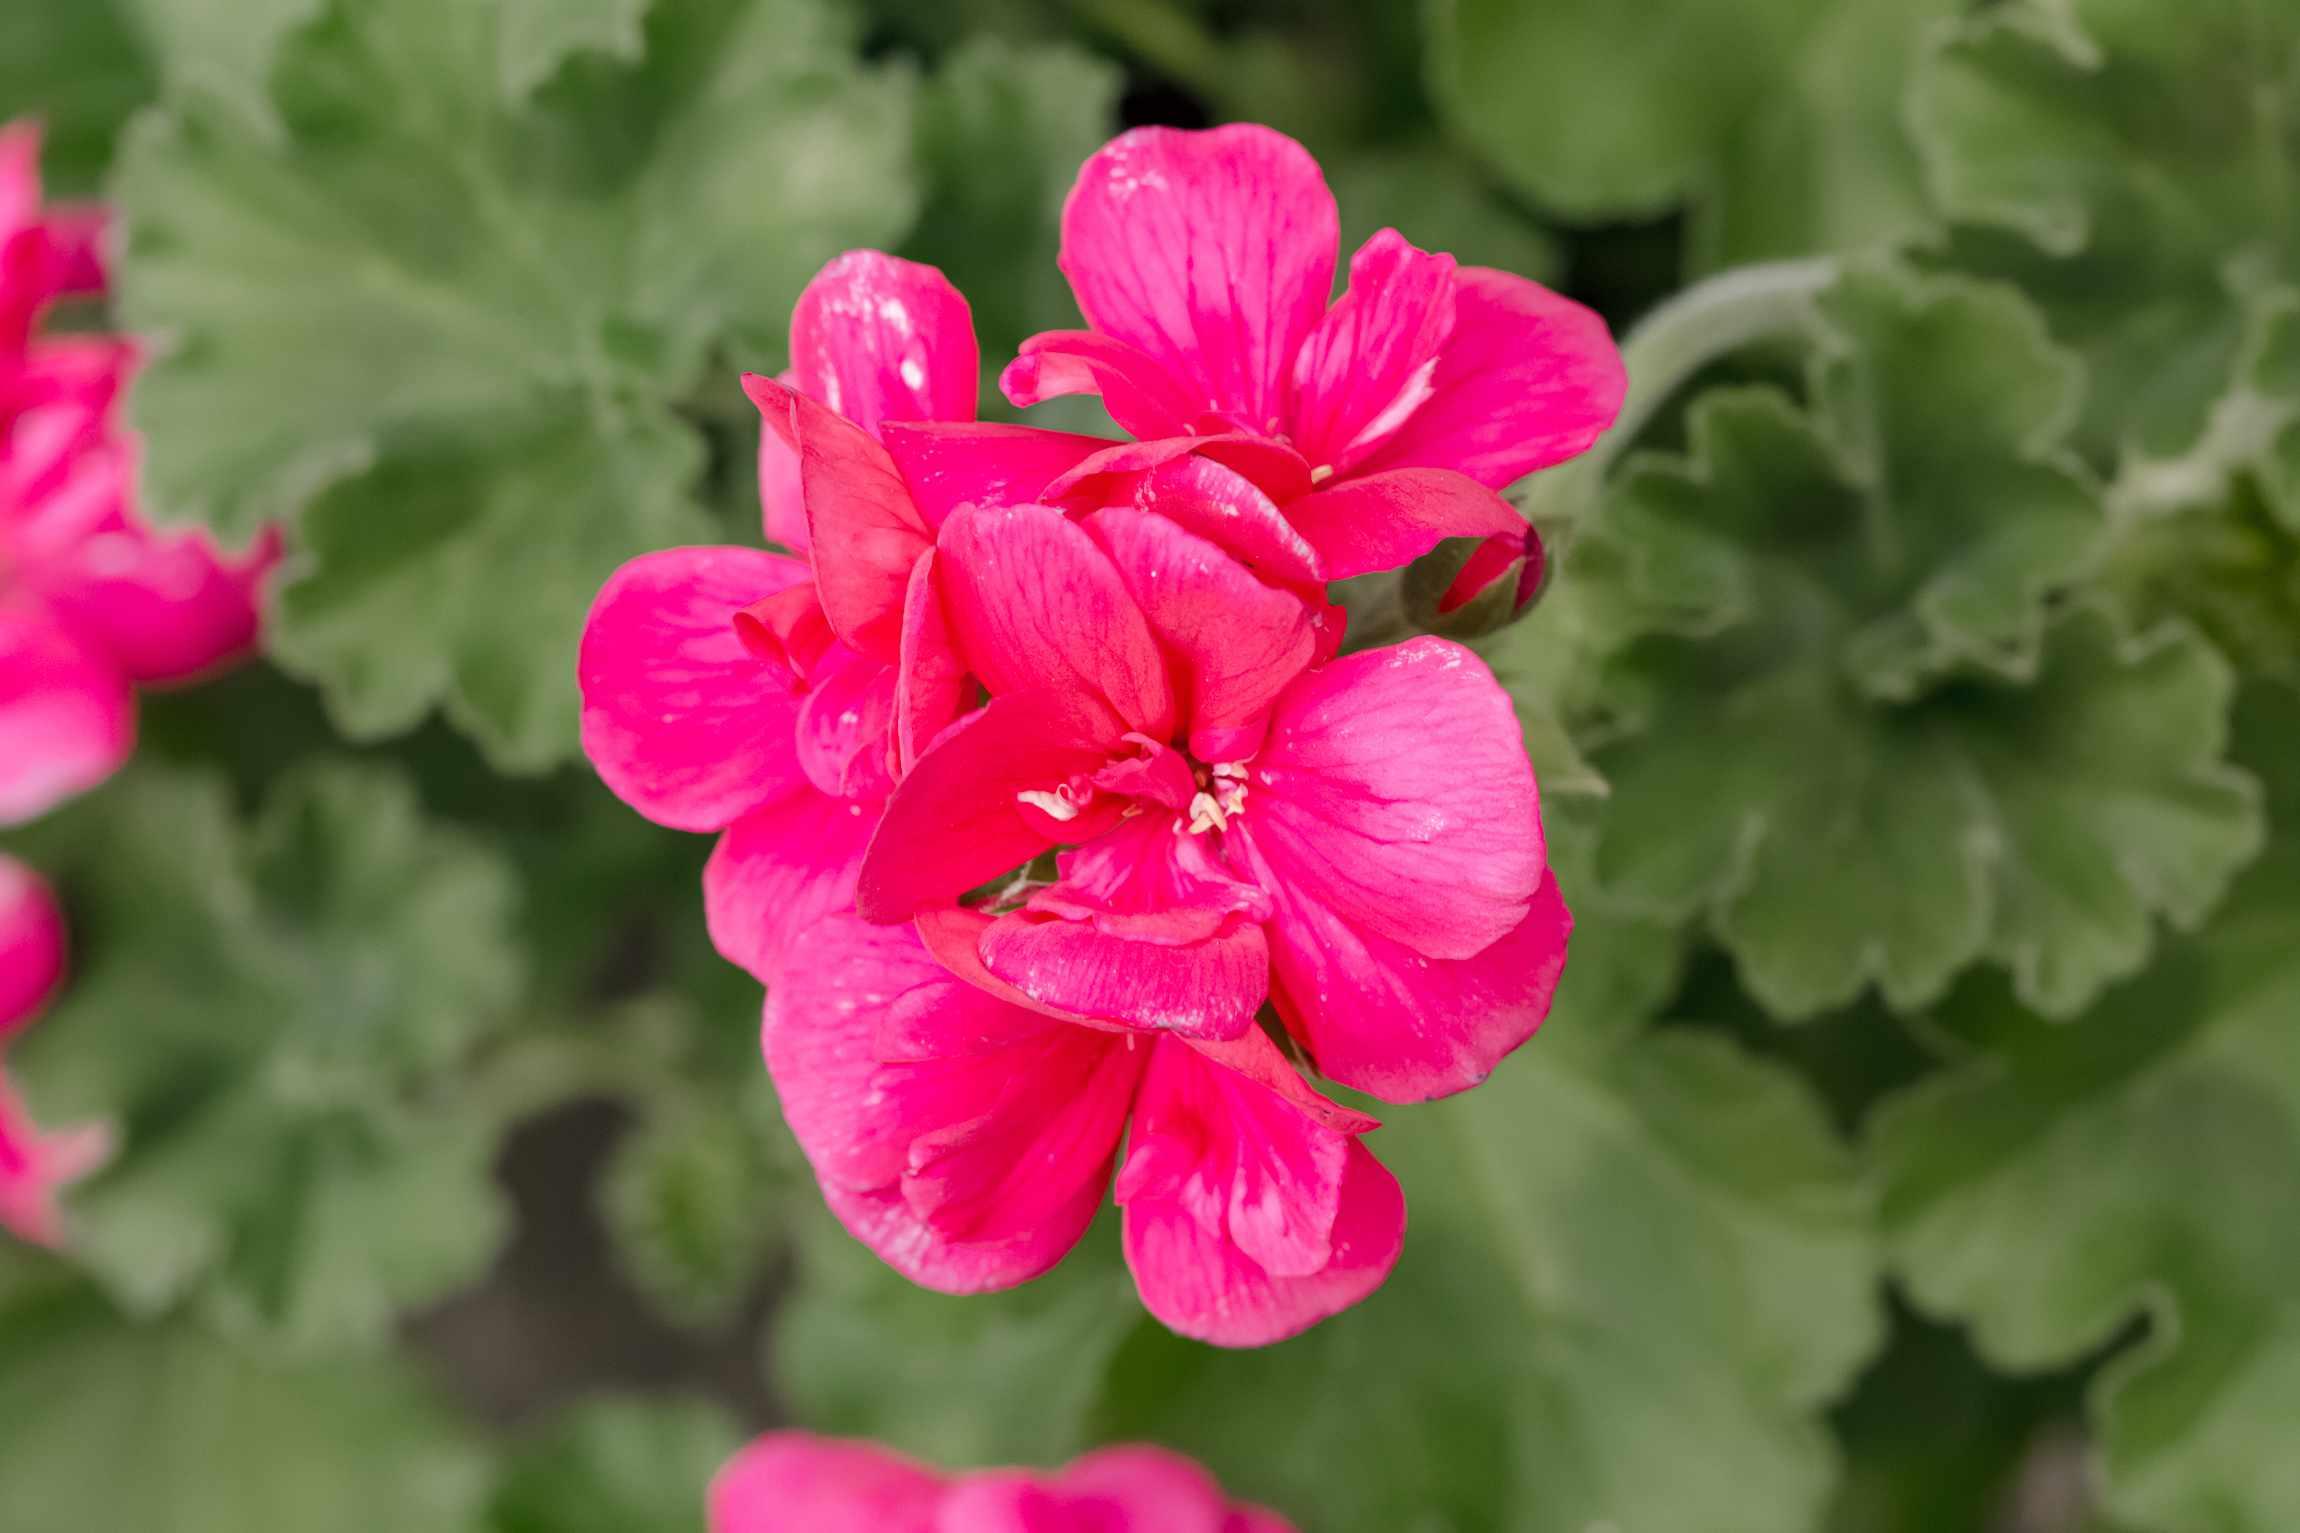 closeup of geranium blooms